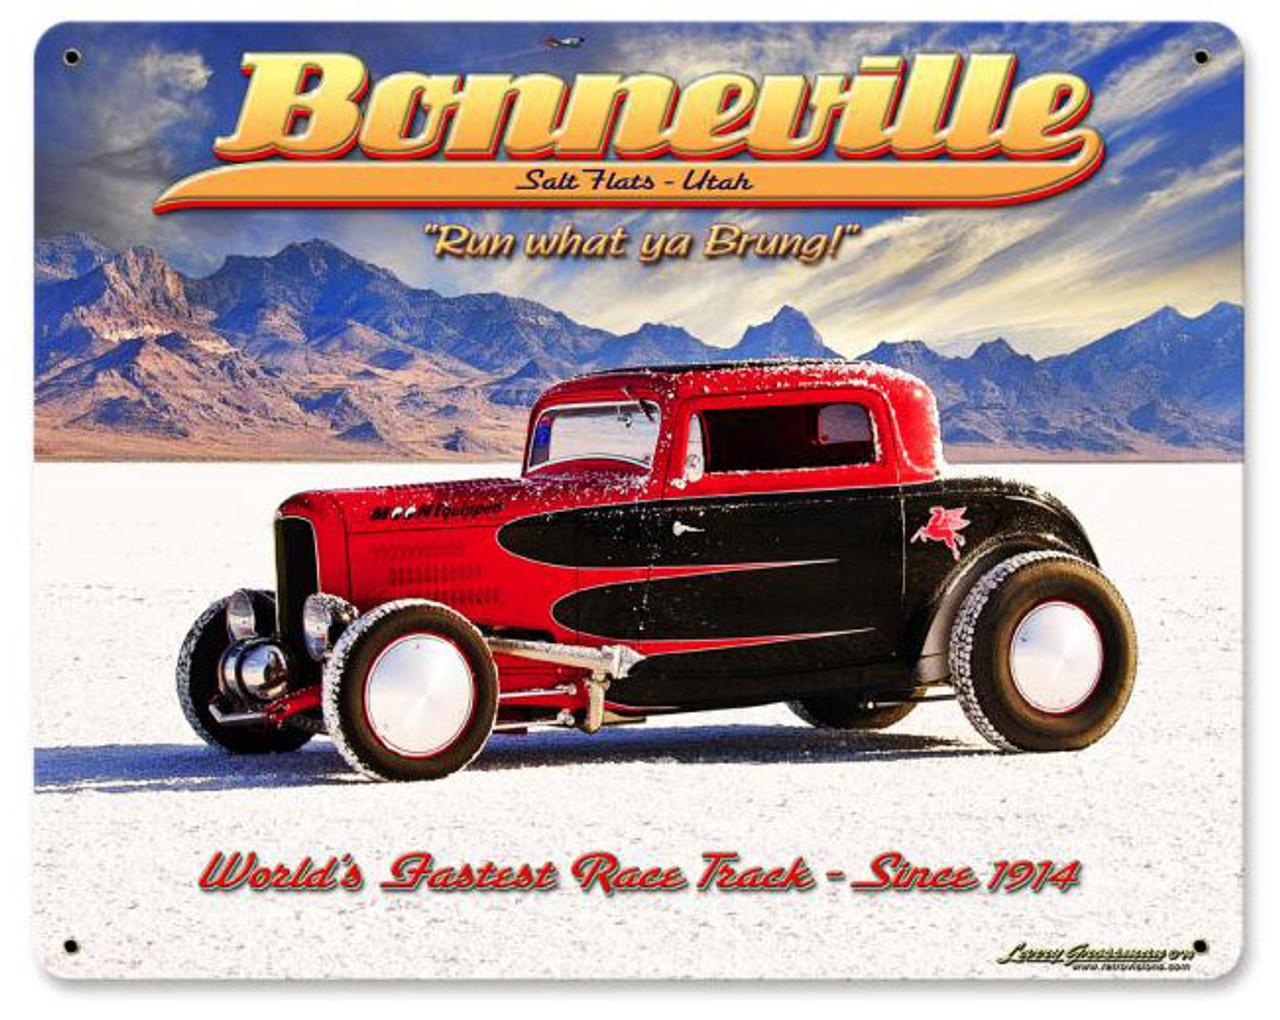 Bonneville Metal Sign 12 x 15 Inches